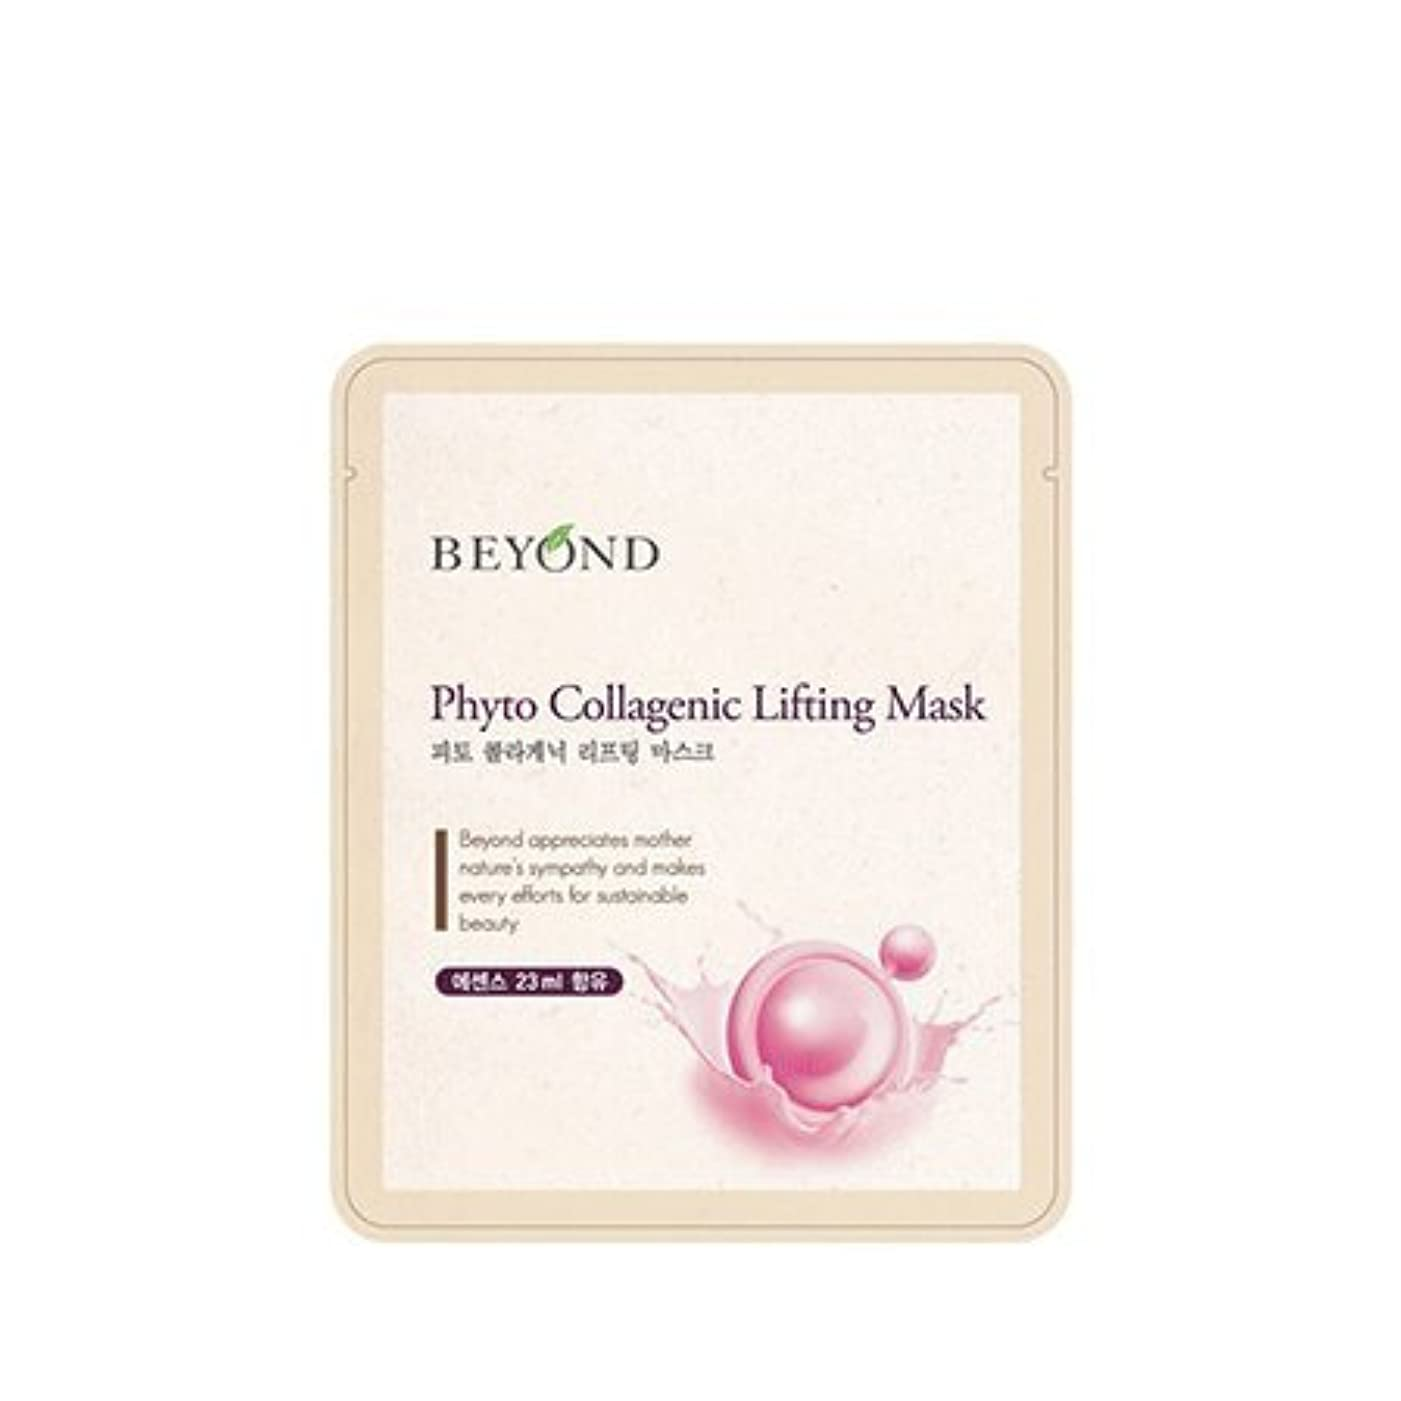 Beyond mask sheet 5ea (Phyto Collagenic Lifting Mask)